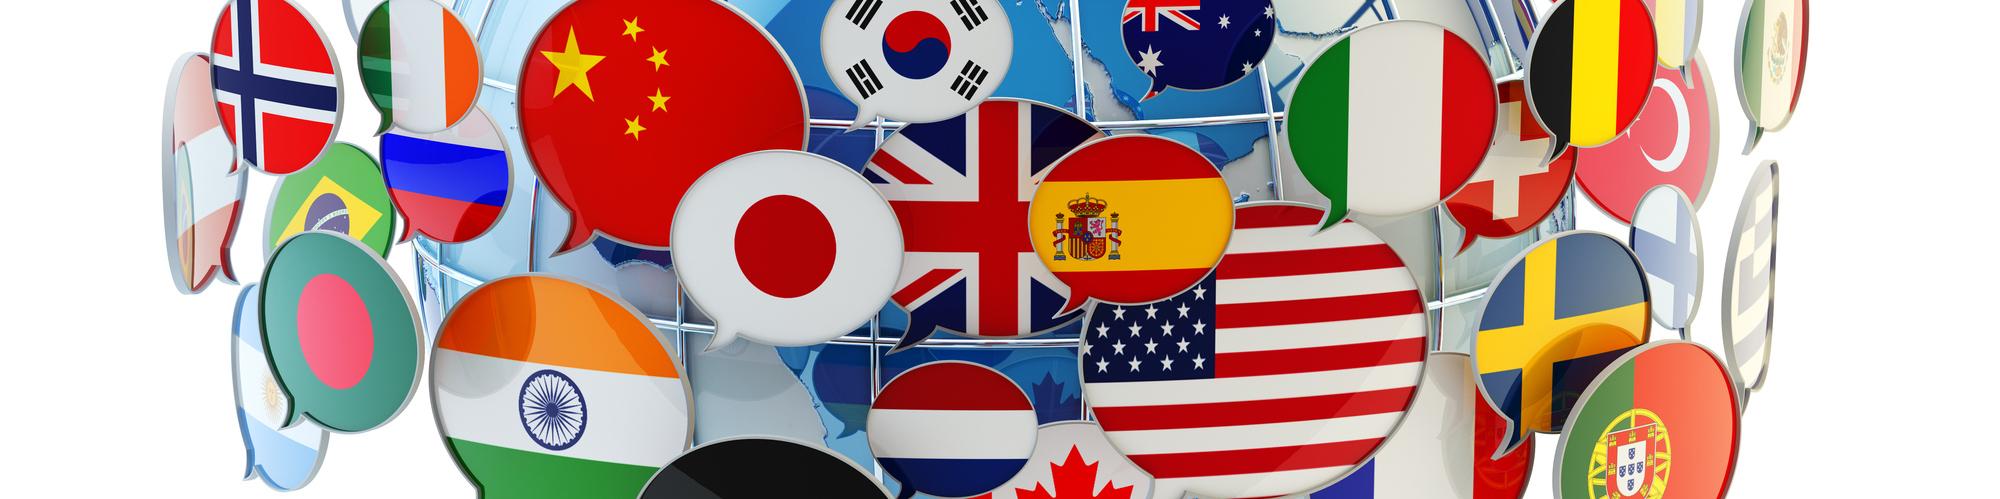 TESOL Flags